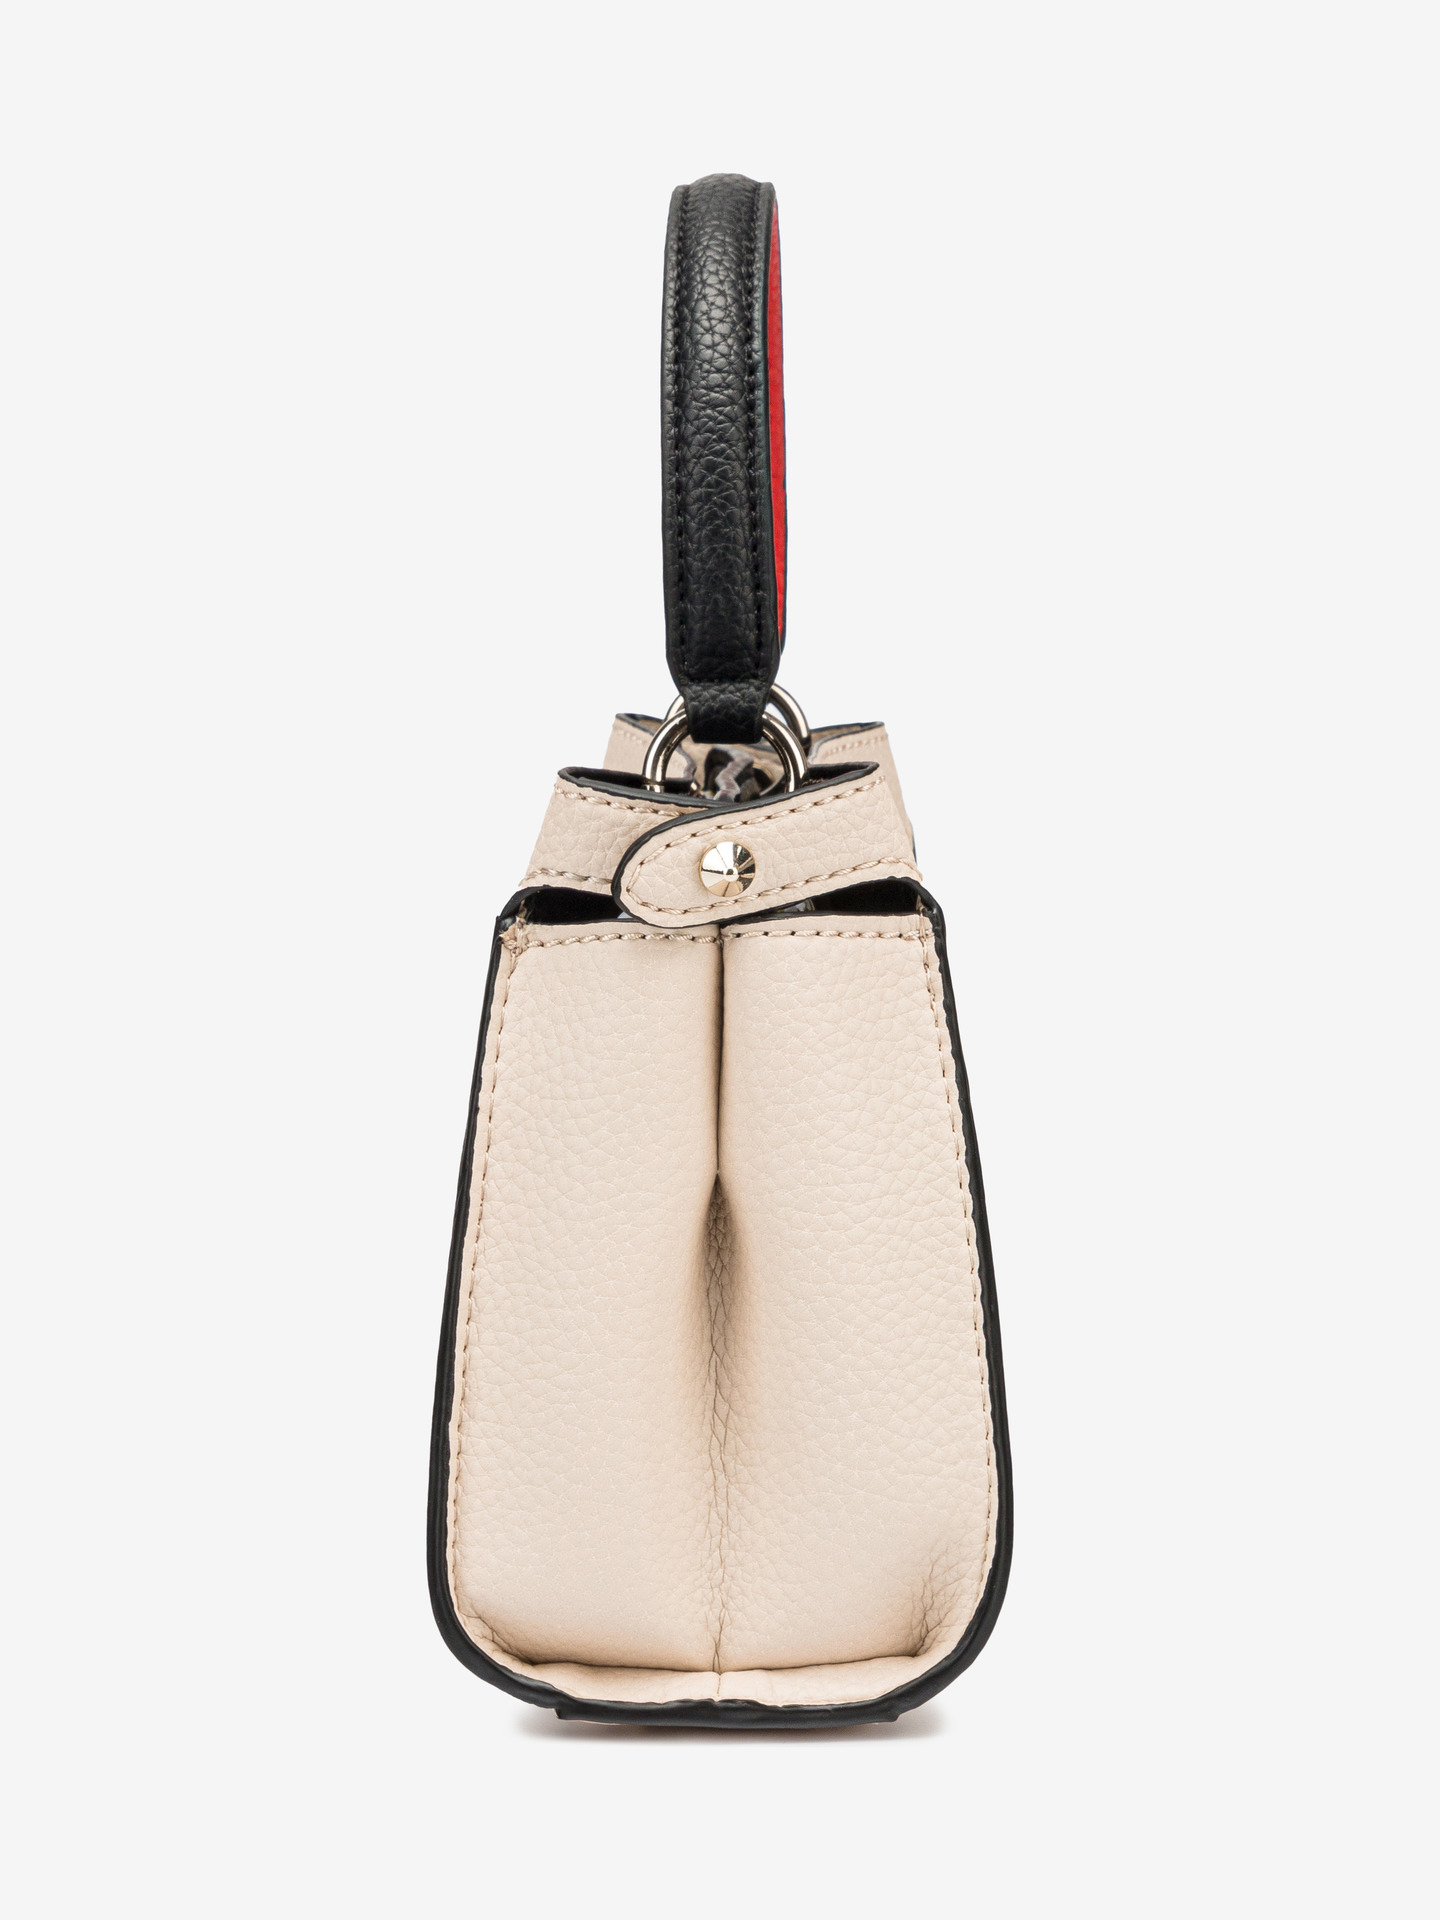 Guess beige handbag Uptown Chic Small